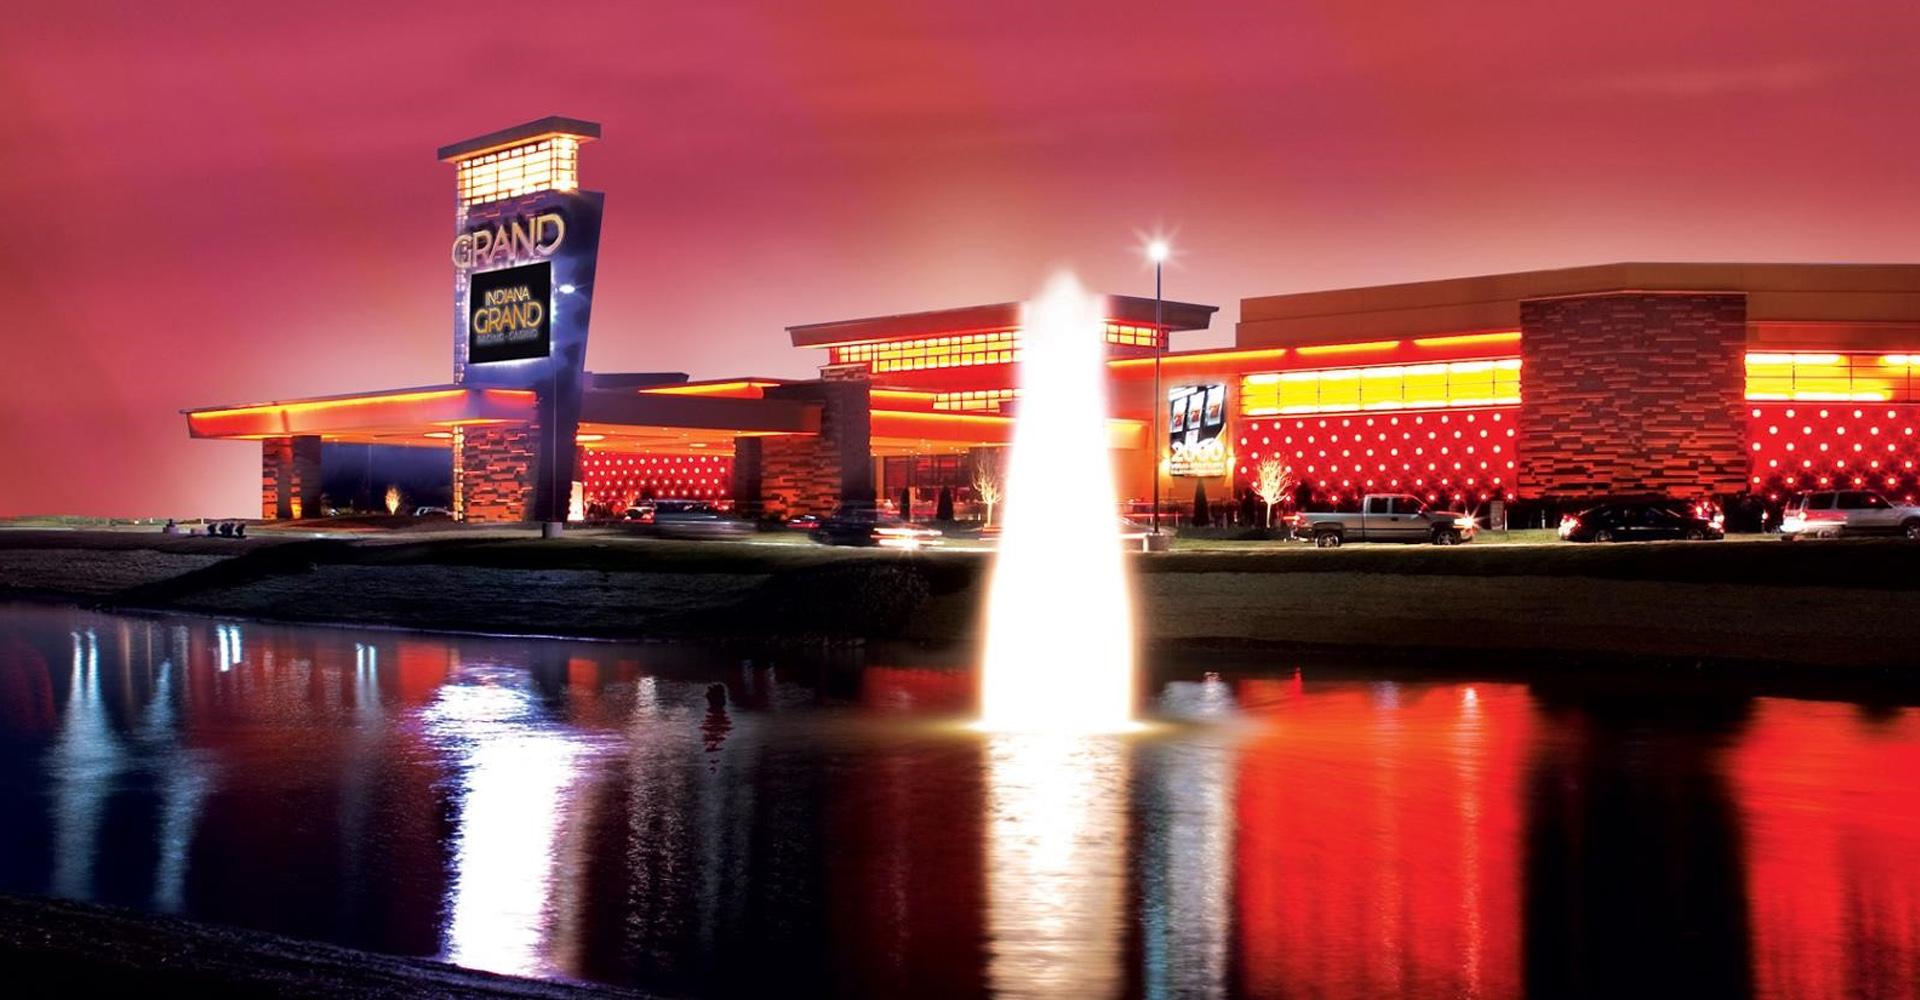 The Indiana Grand Casino